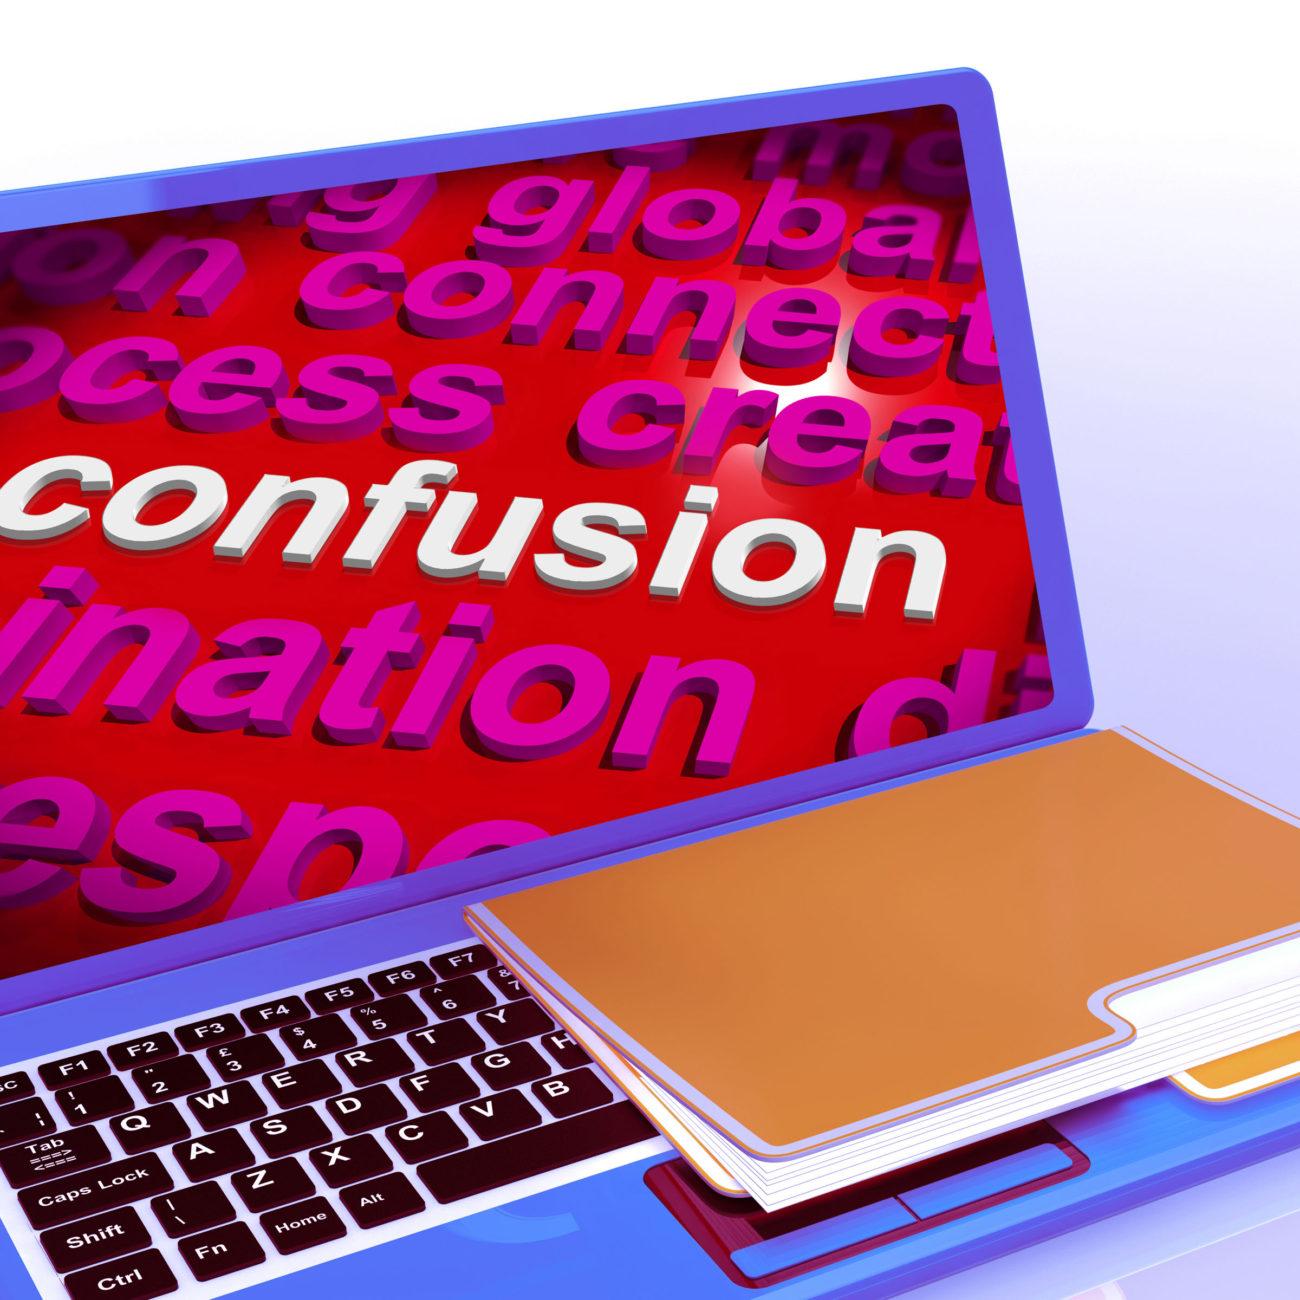 Coyk: Broadband Jargon Explained